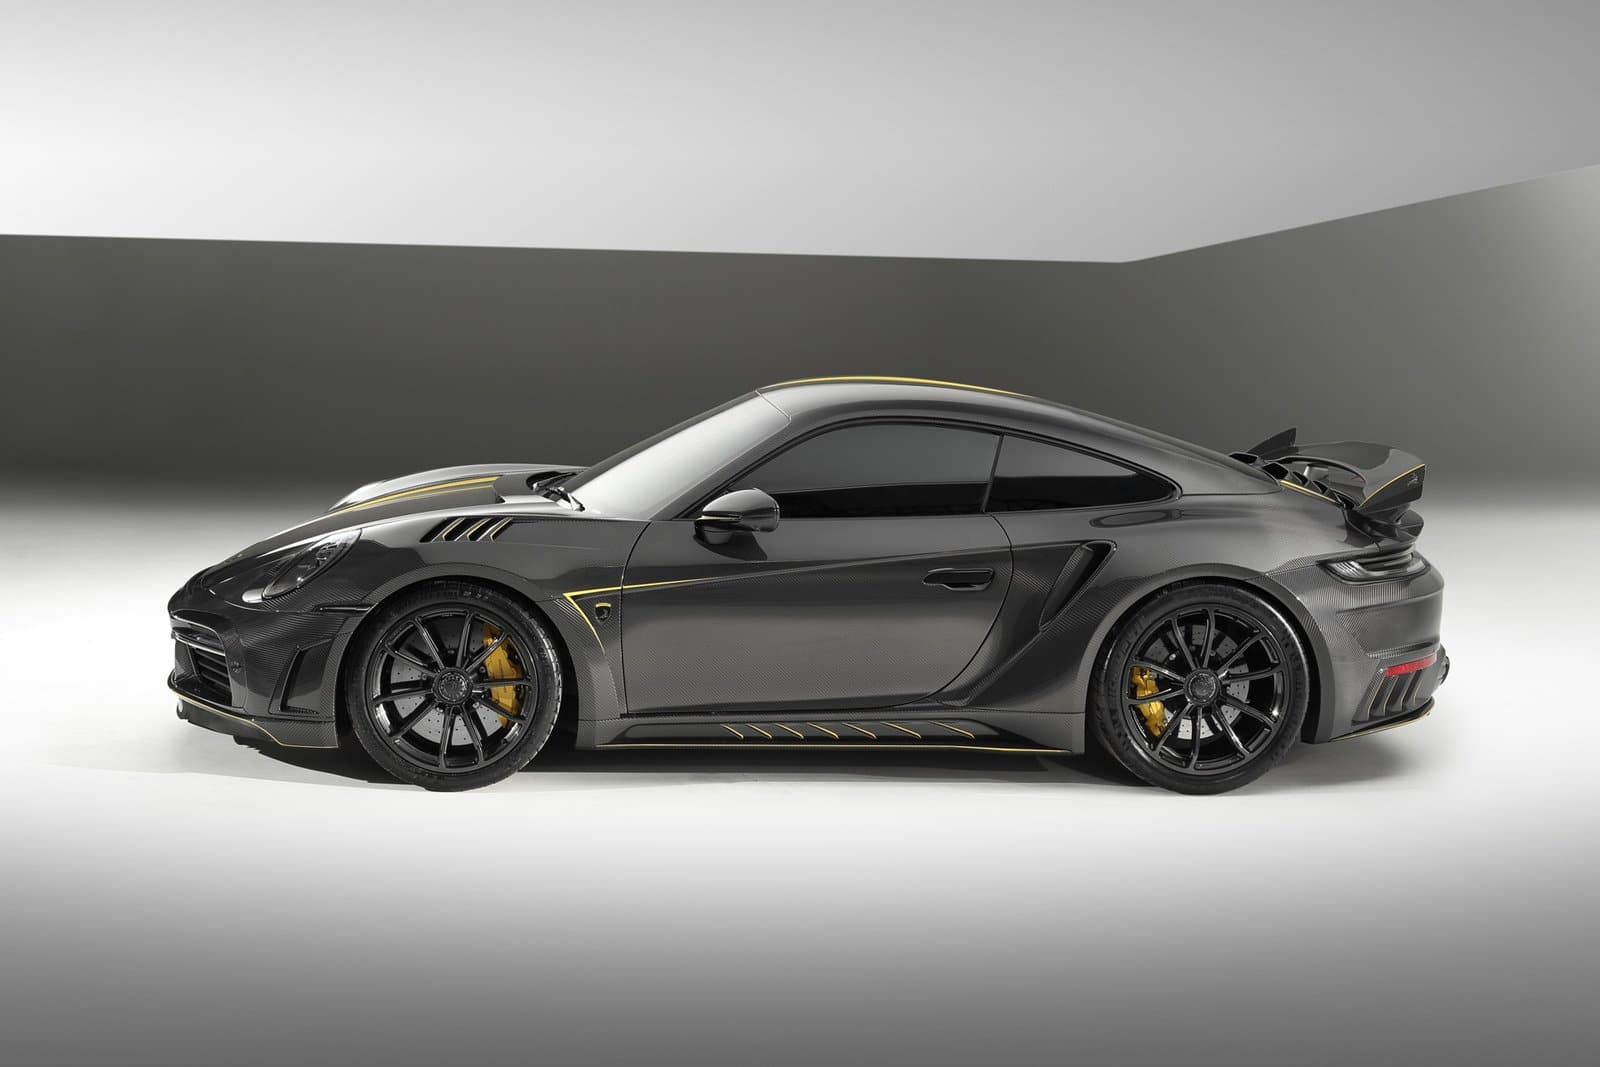 Solo habrá 13 ejemplares del Porsche 992 Stinger GTR Limited Carbon Edition